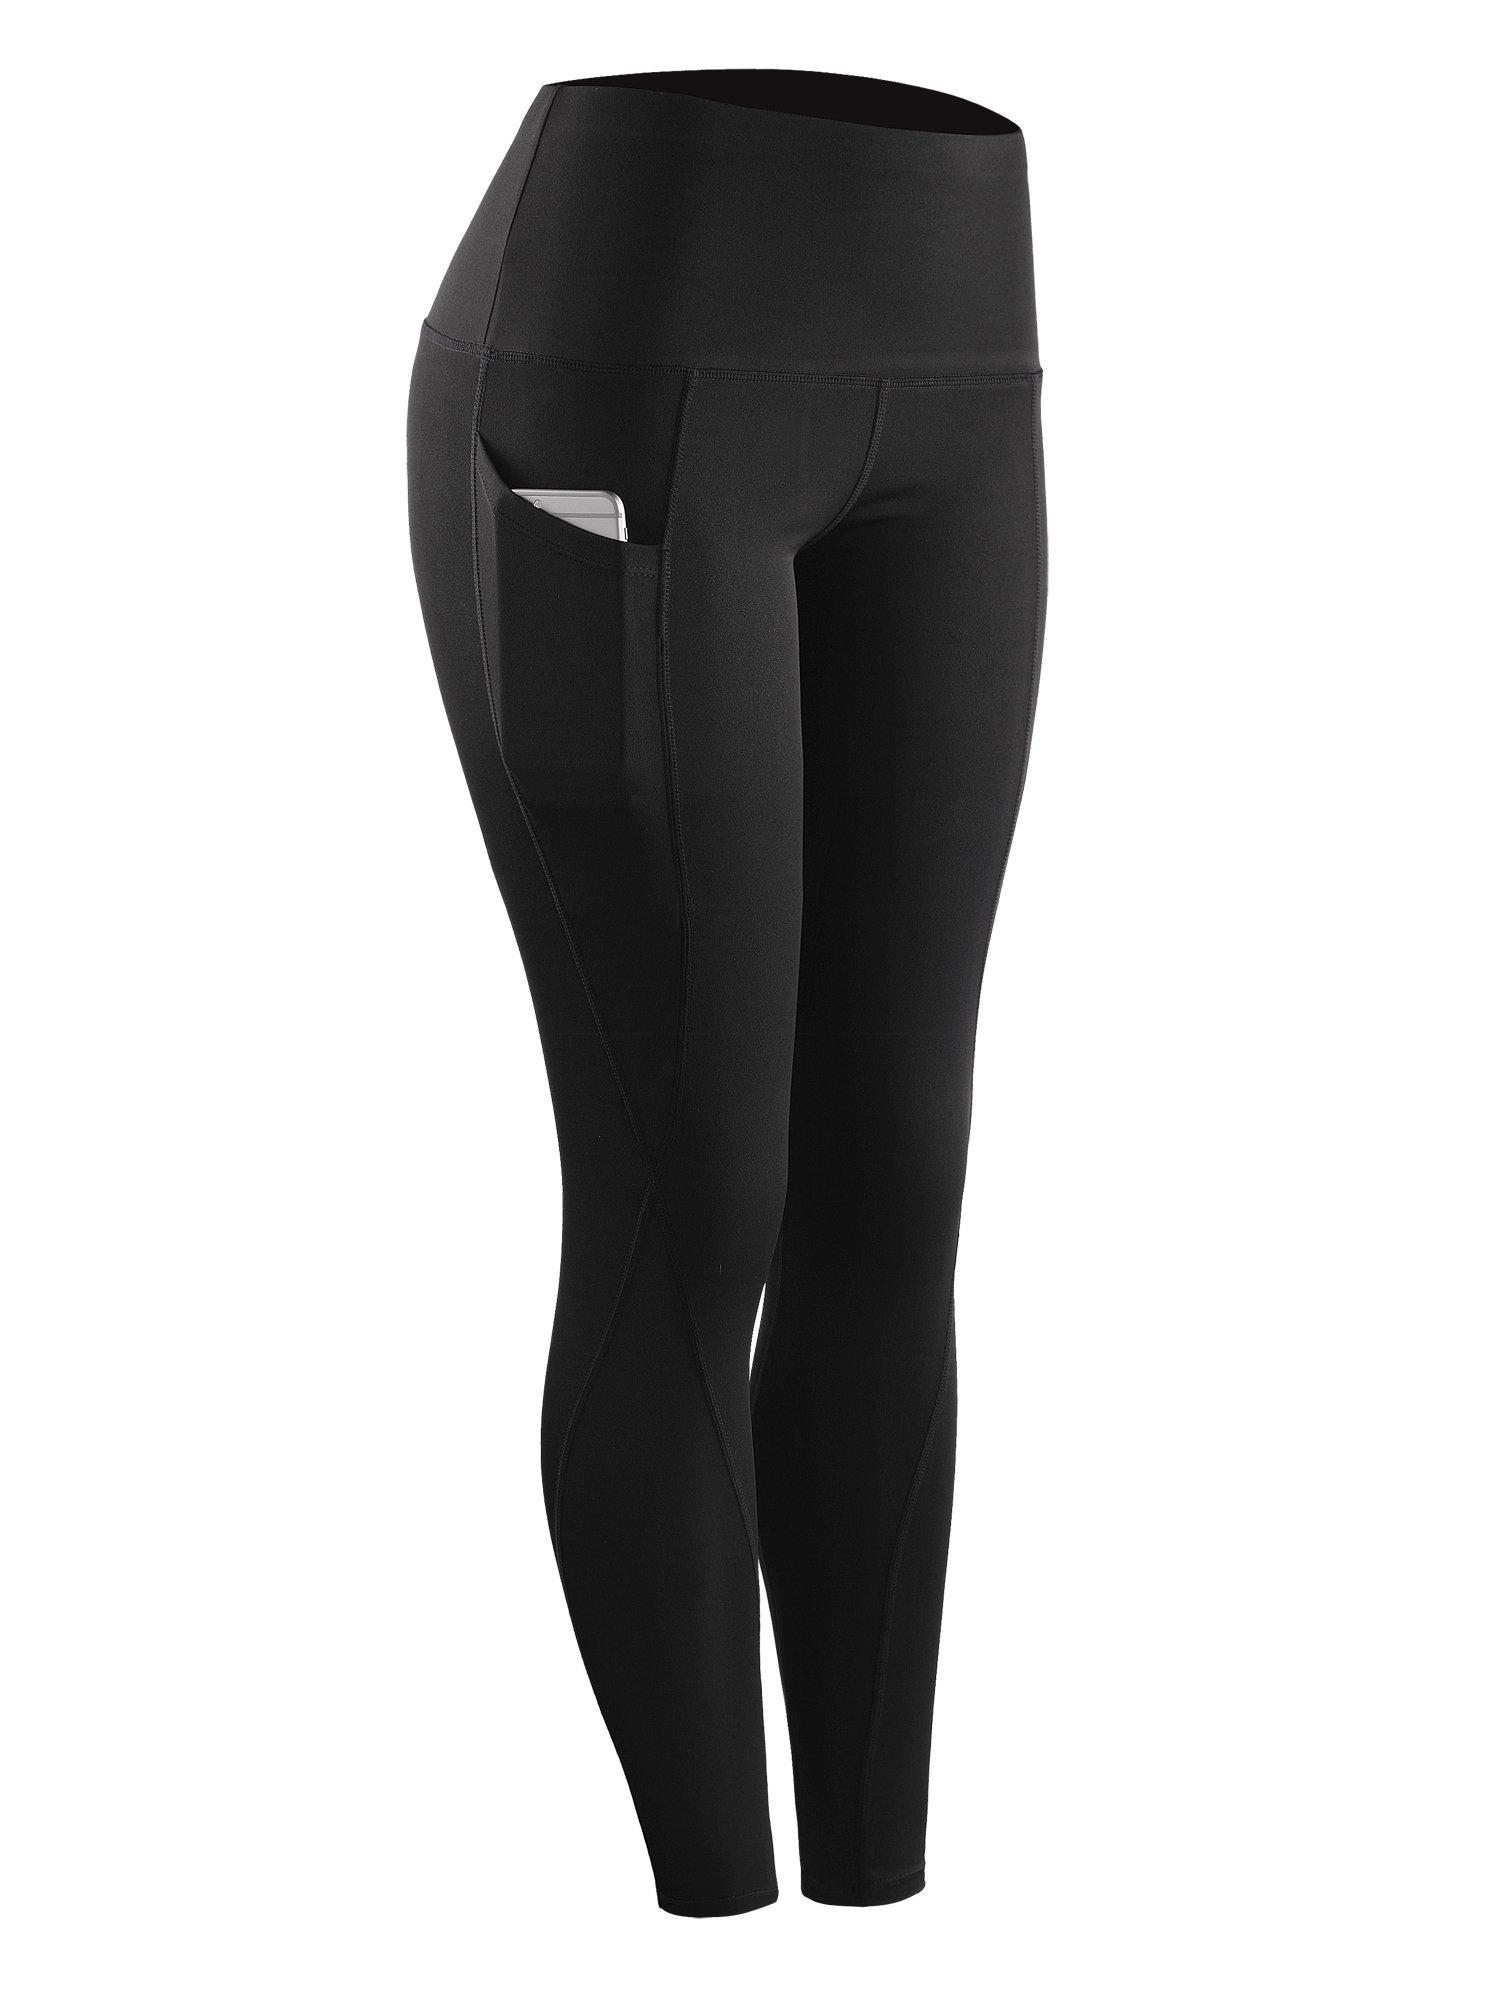 Neleus Tummy Control High Waist Running Workout Leggings,9017,One Piece,Black,S,EU M